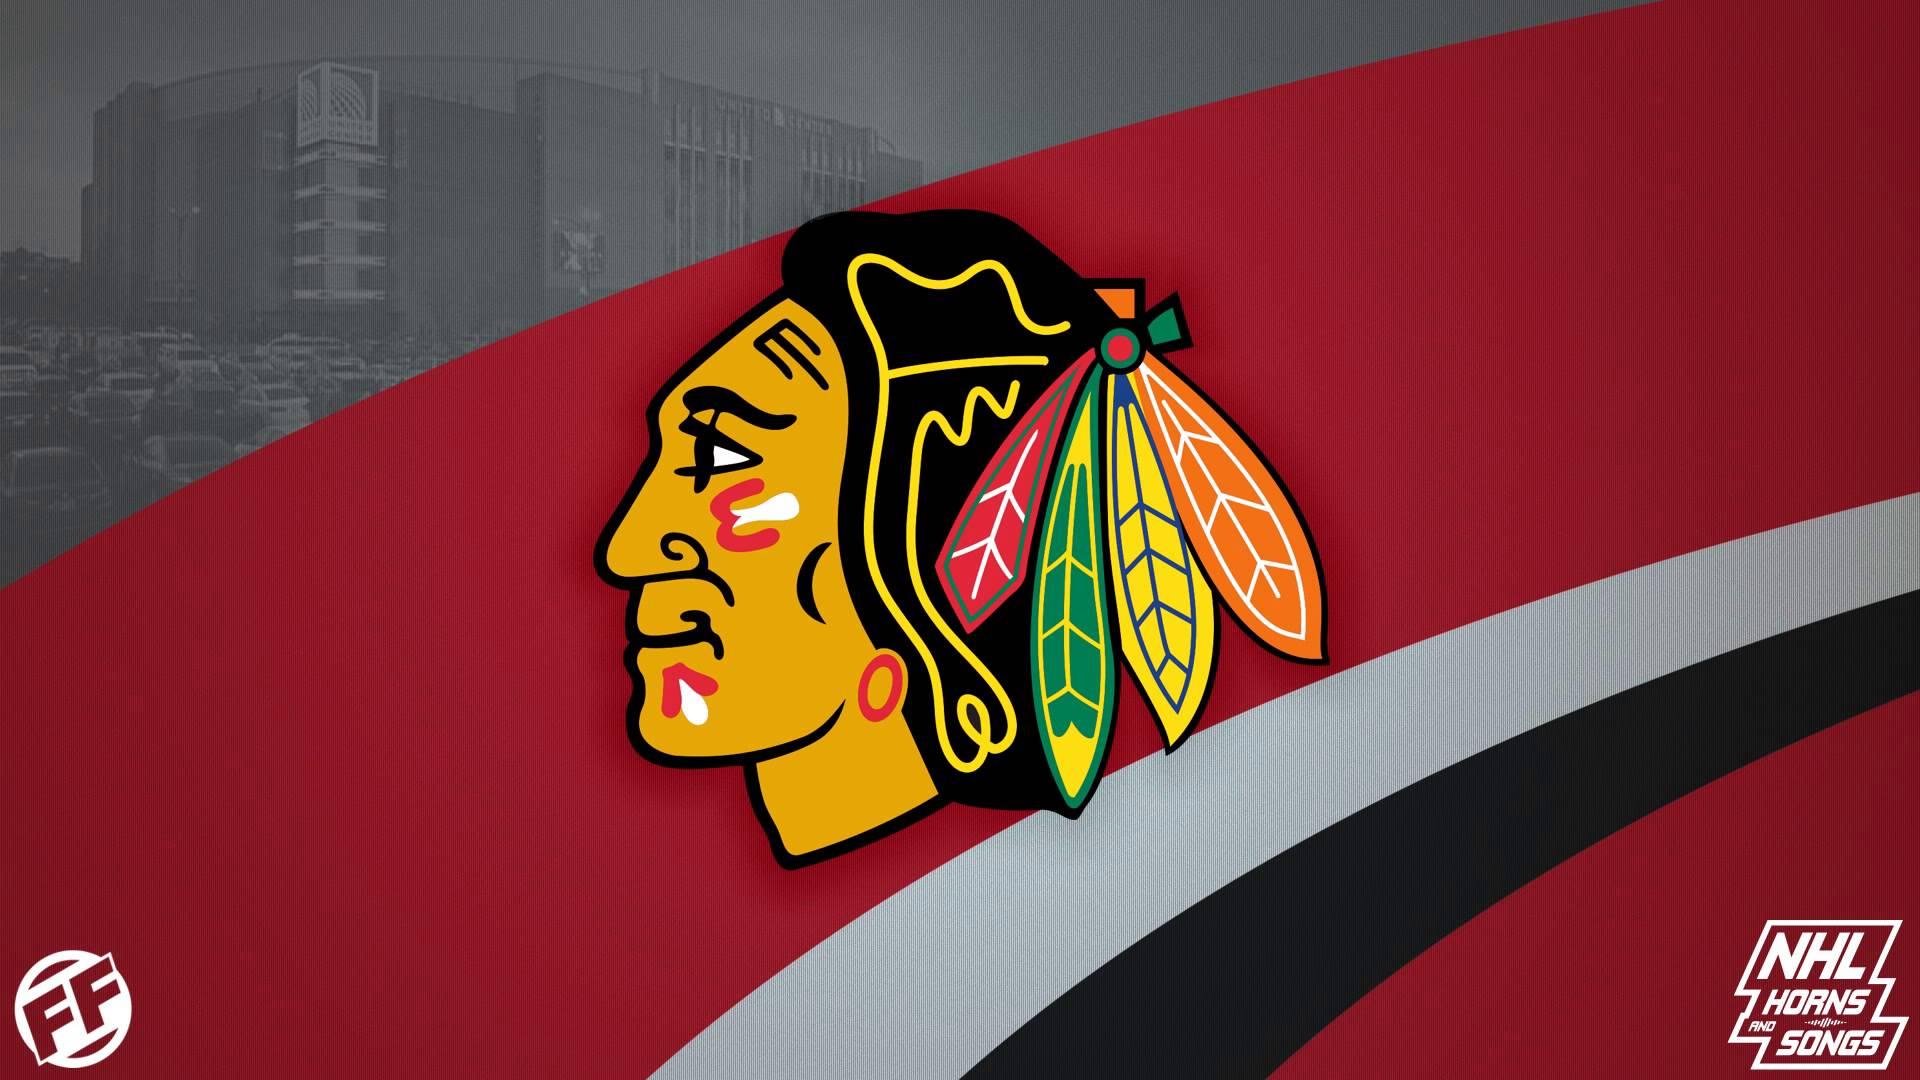 High Resolution Wallpaper | Chicago Blackhawks 1920x1080 px